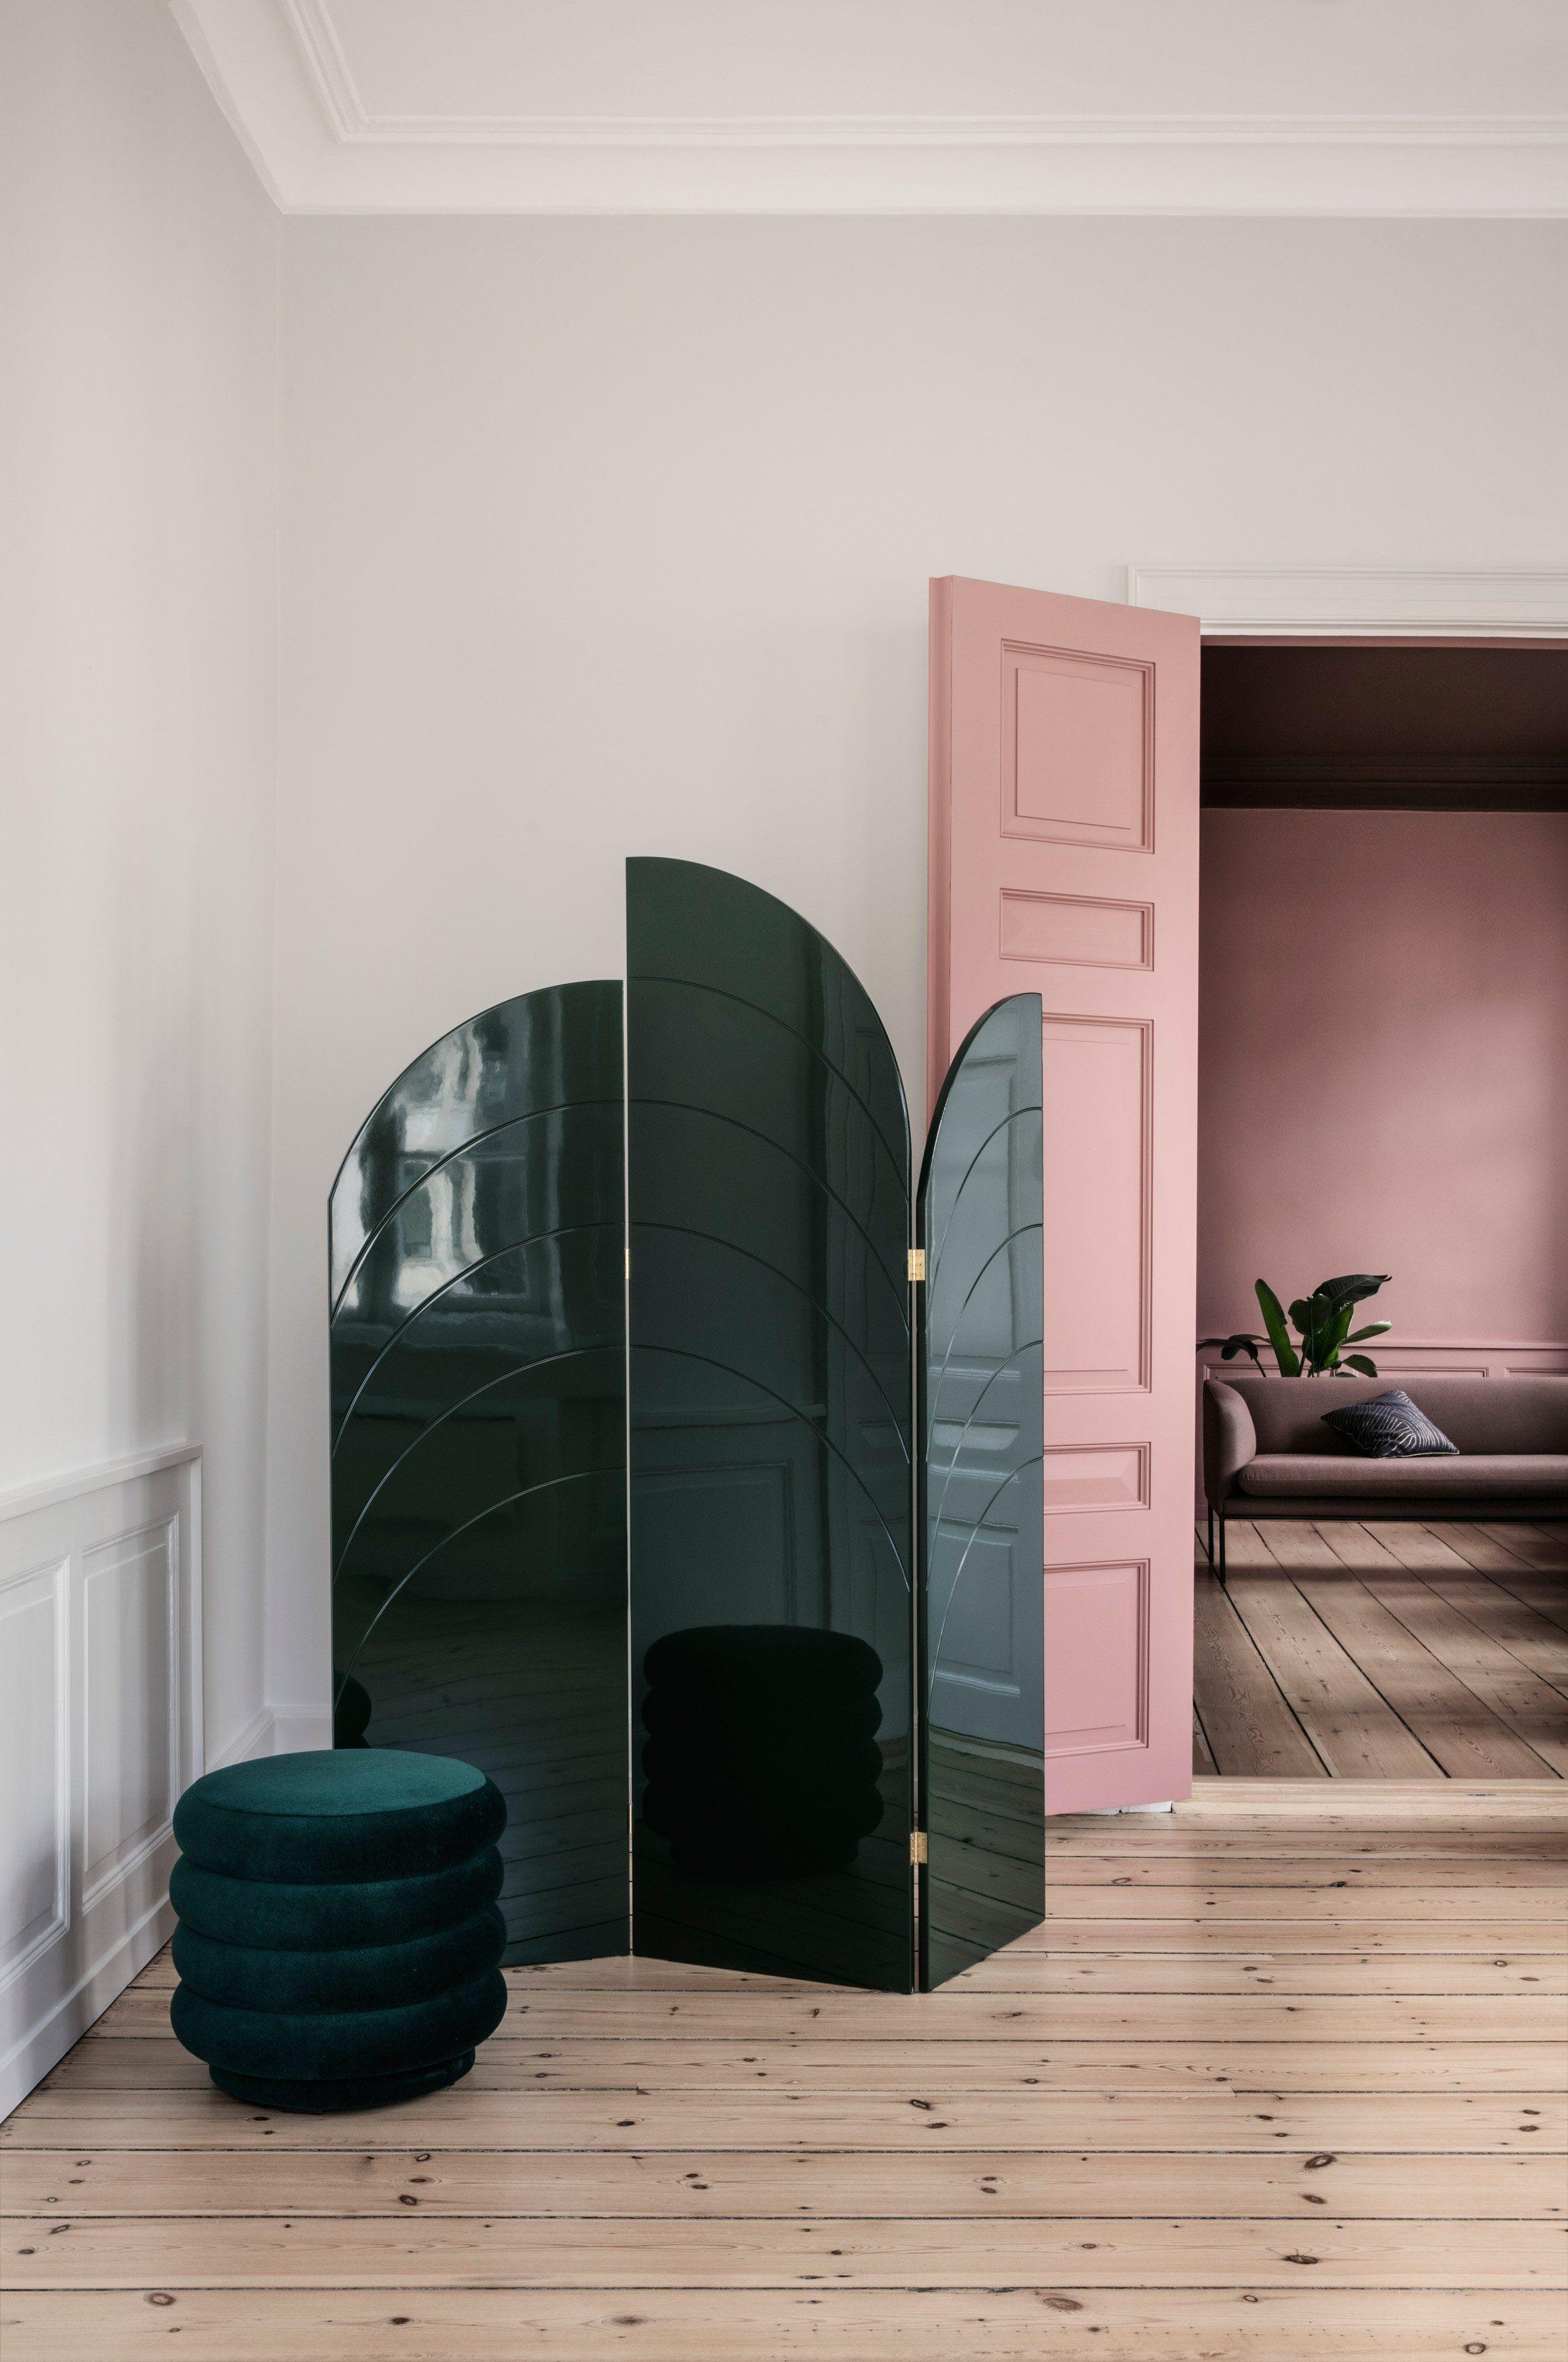 Danish brand ferm livingus autumn winter collection titled the